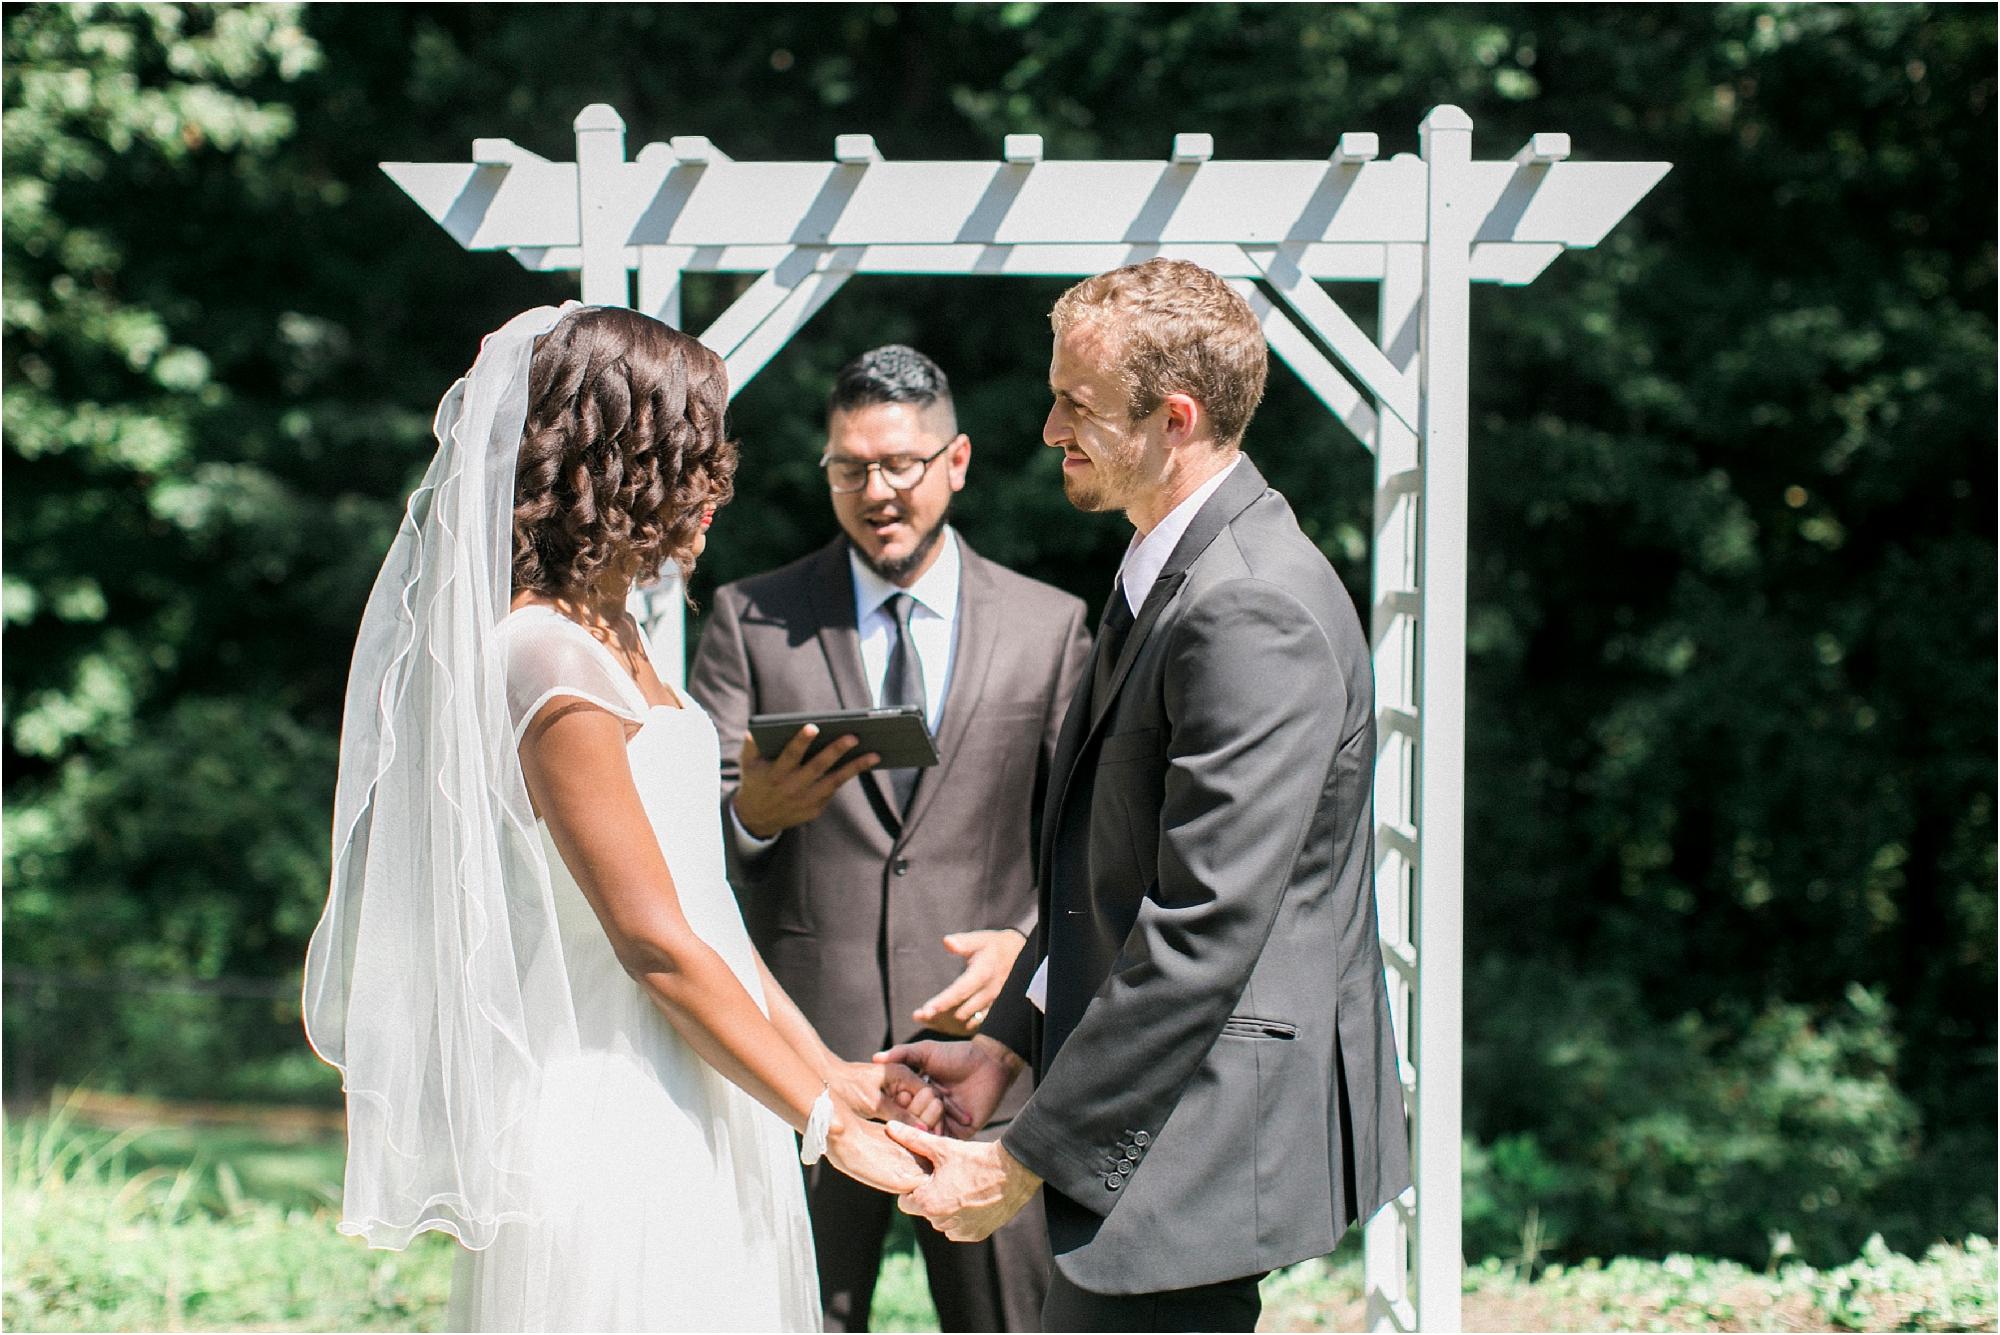 inimate-richmond-virginia-backyard-summer-wedding-photos_0009.jpg